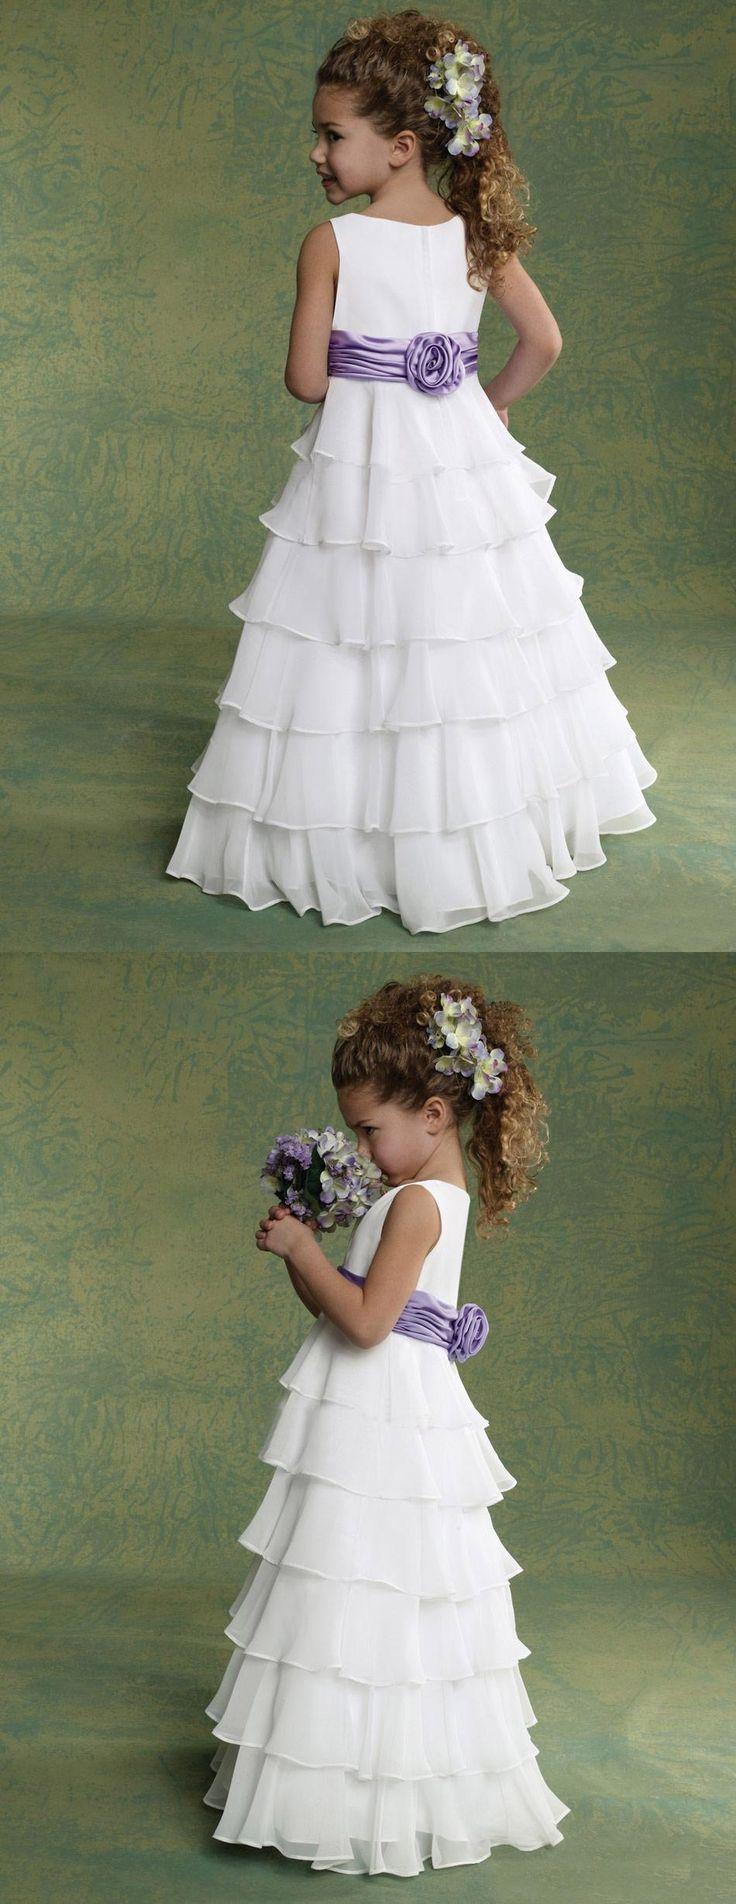 Flower Girl Dresses For Wedding A-Line Sleeveless Floor Length Chiffon girls pageant dresses New Hot